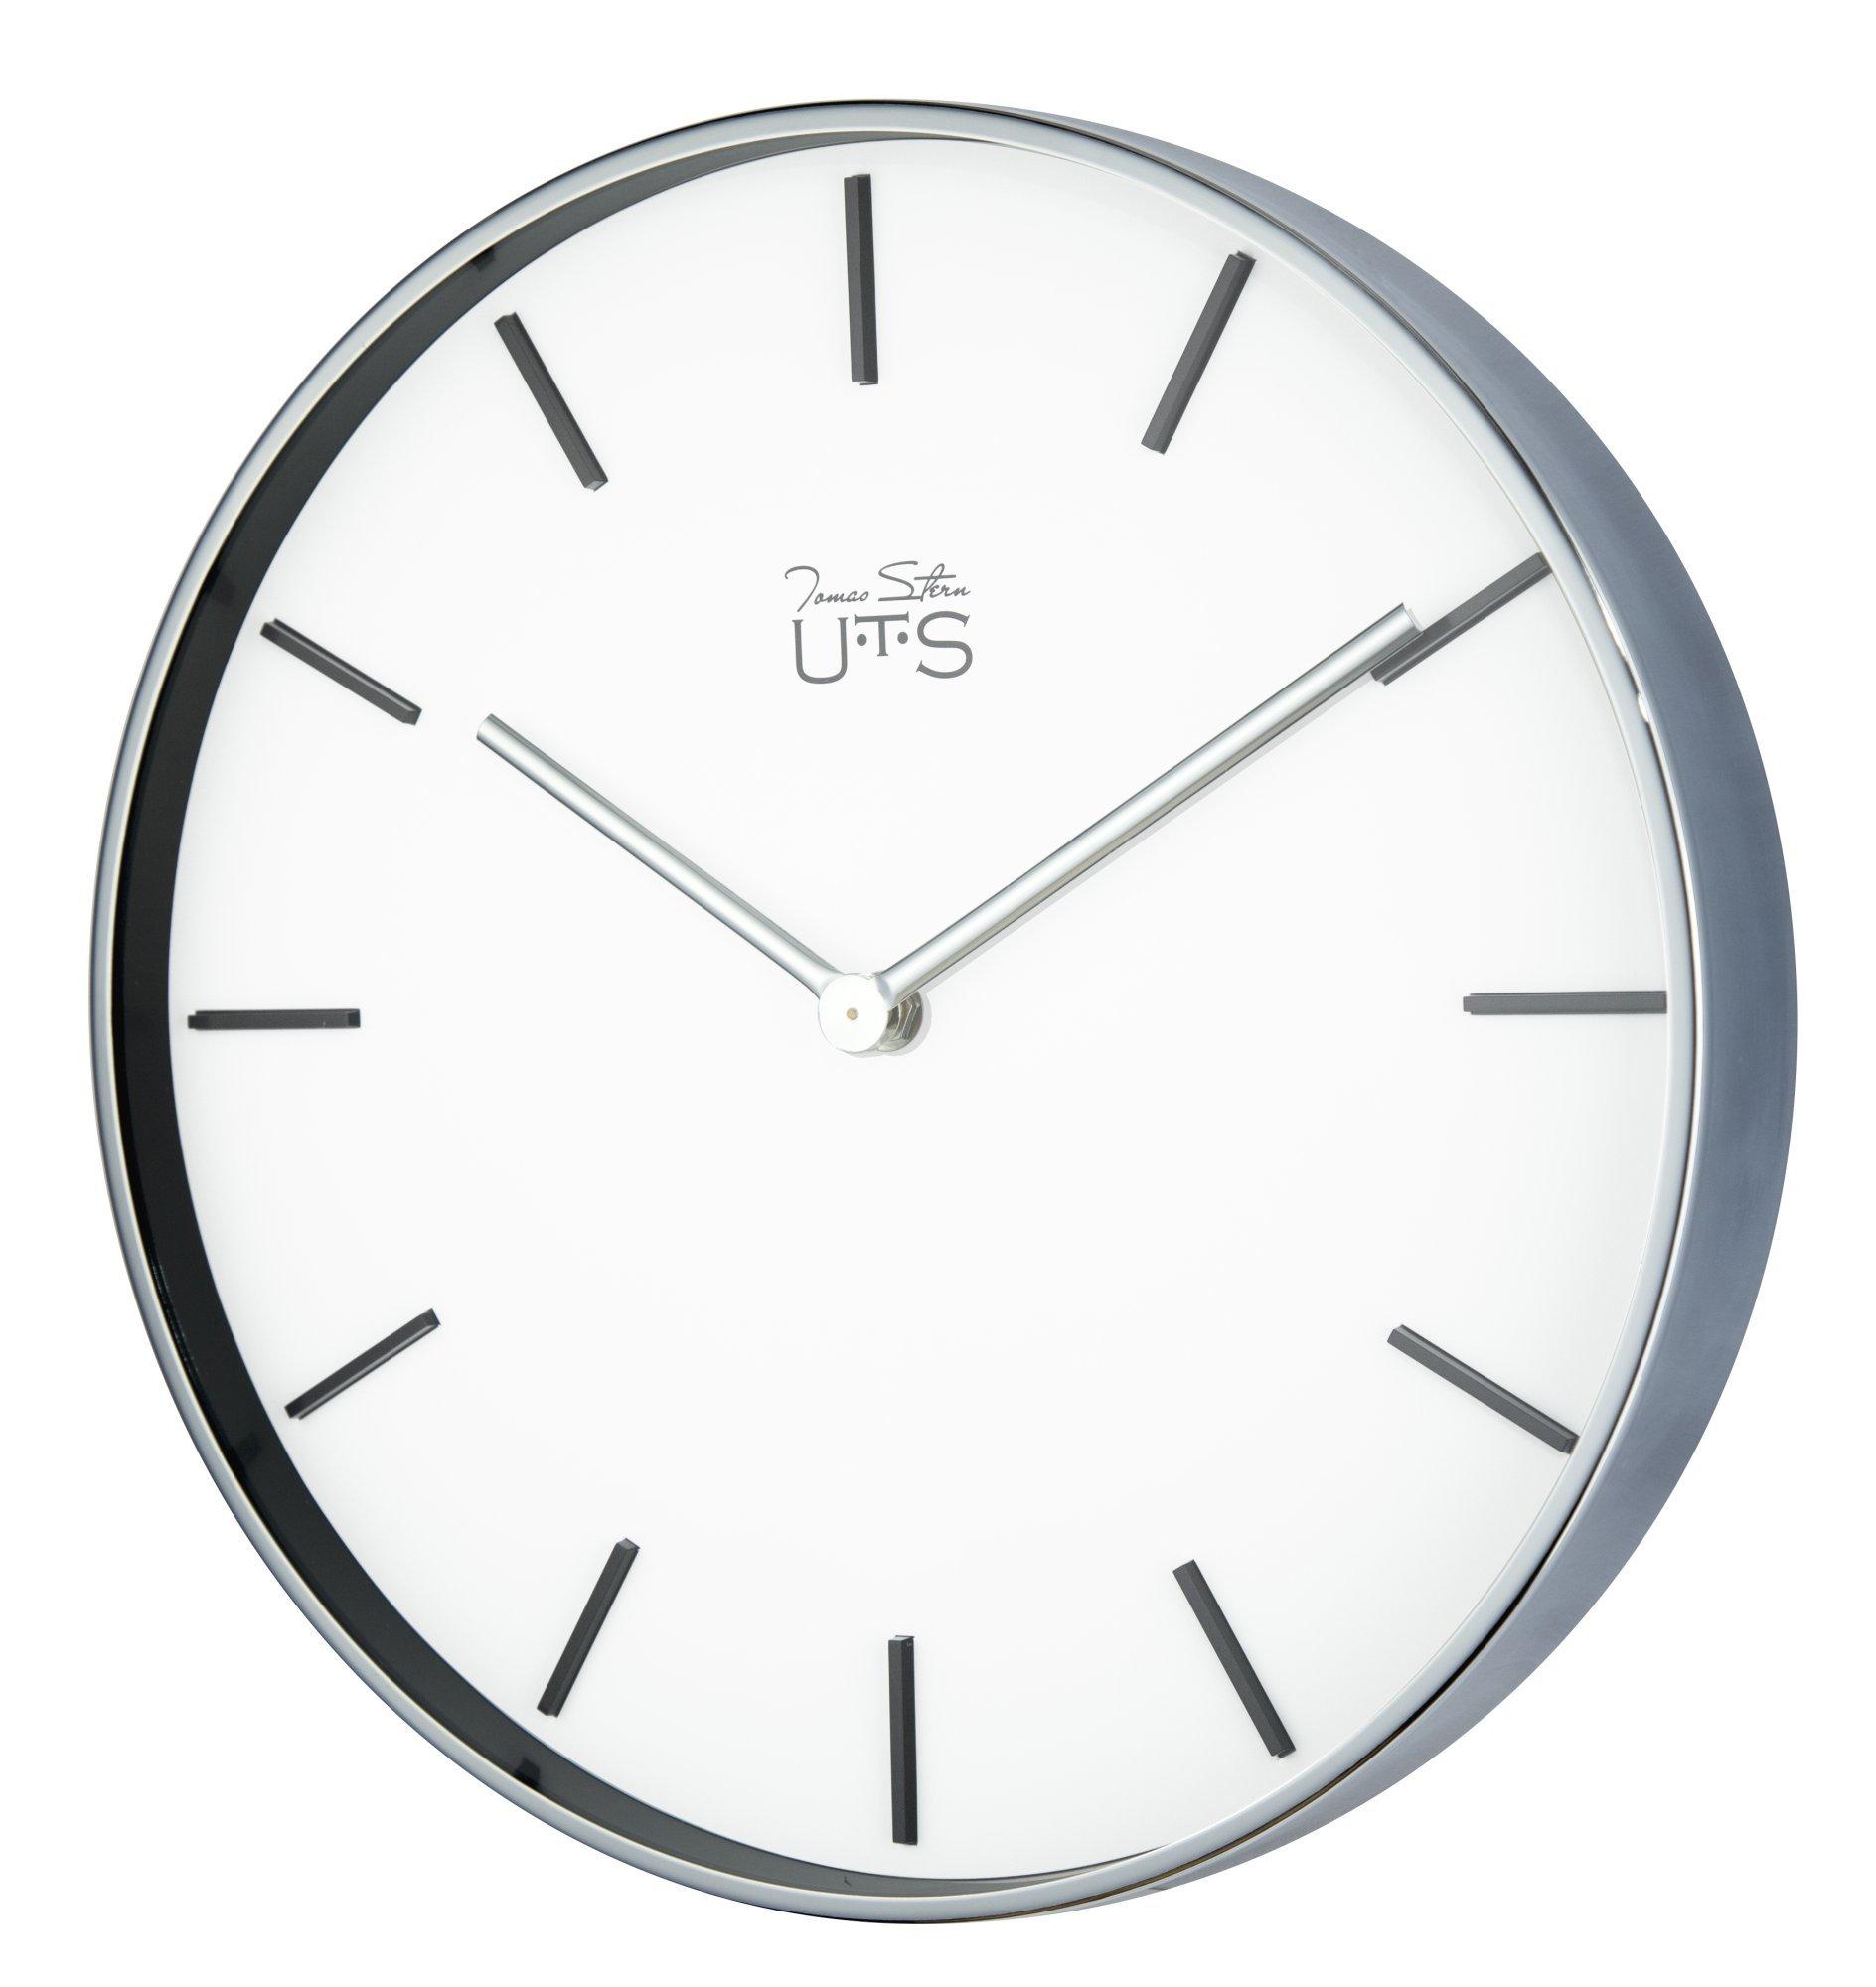 Часы настенные Часы настенные Tomas Stern 4004S chasy-nastennye-tomas-stern-4004s-germaniya.jpg